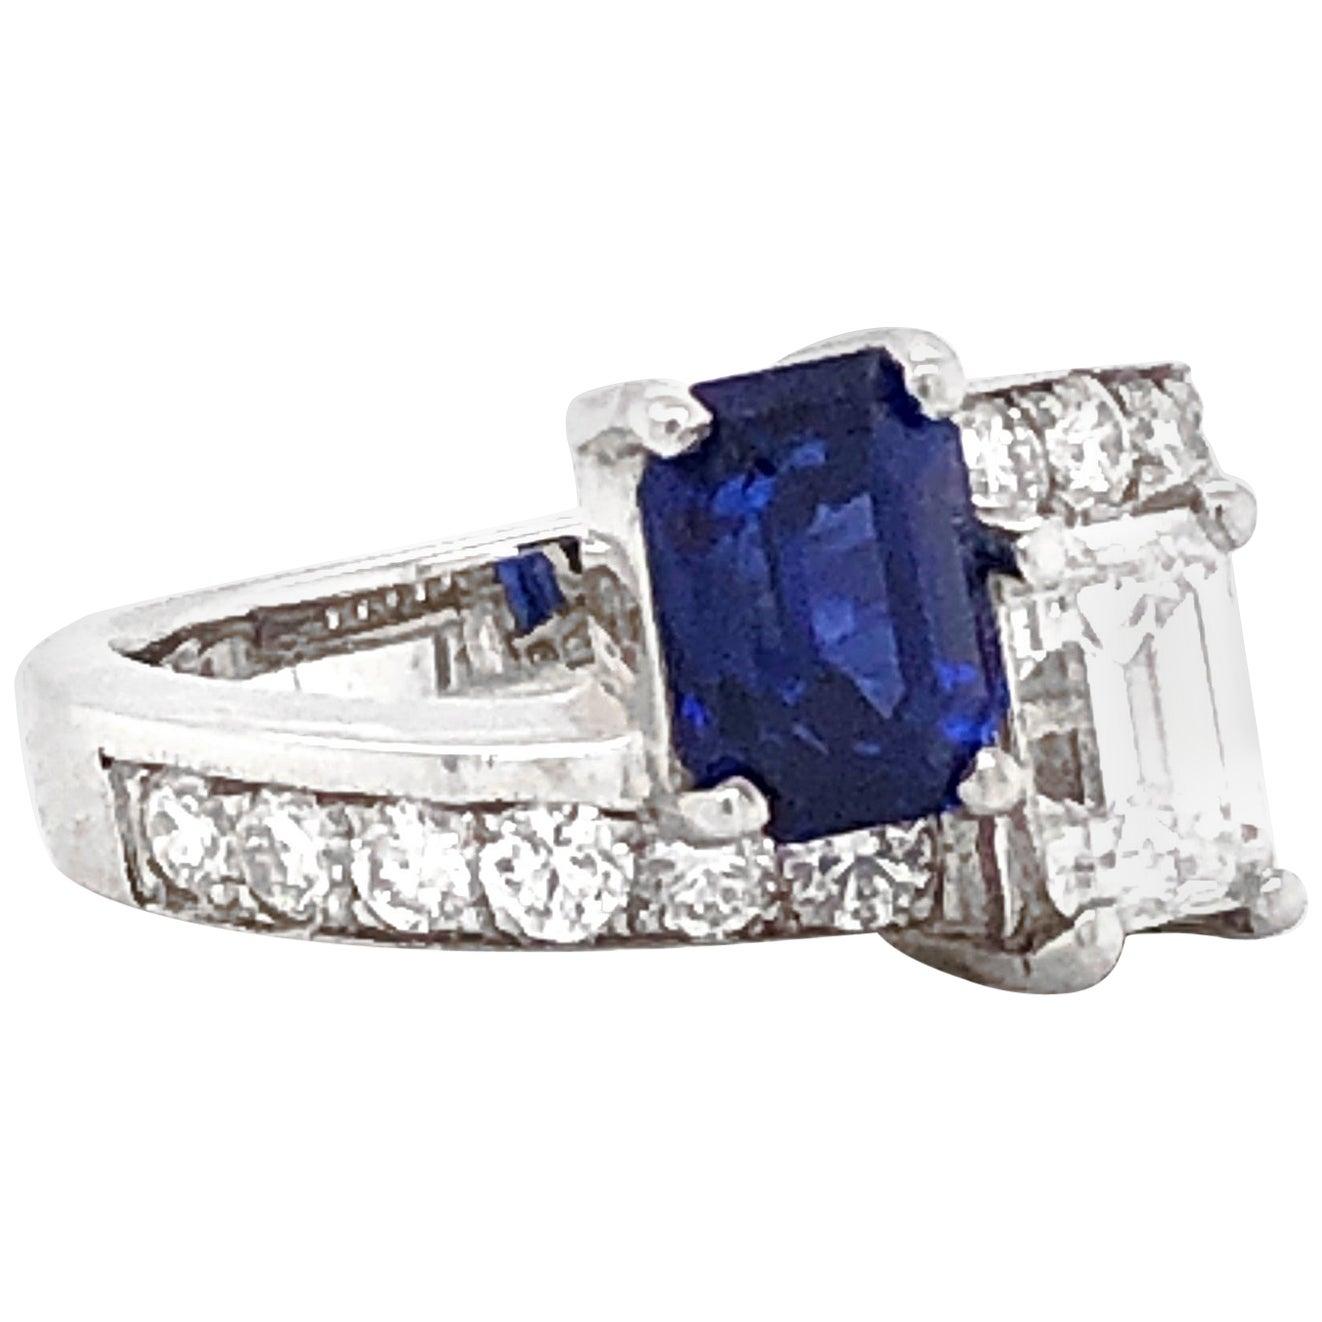 GIA Certified Pair of Emerald Cut Ceylon Sapphire and Diamond Platinum Ring